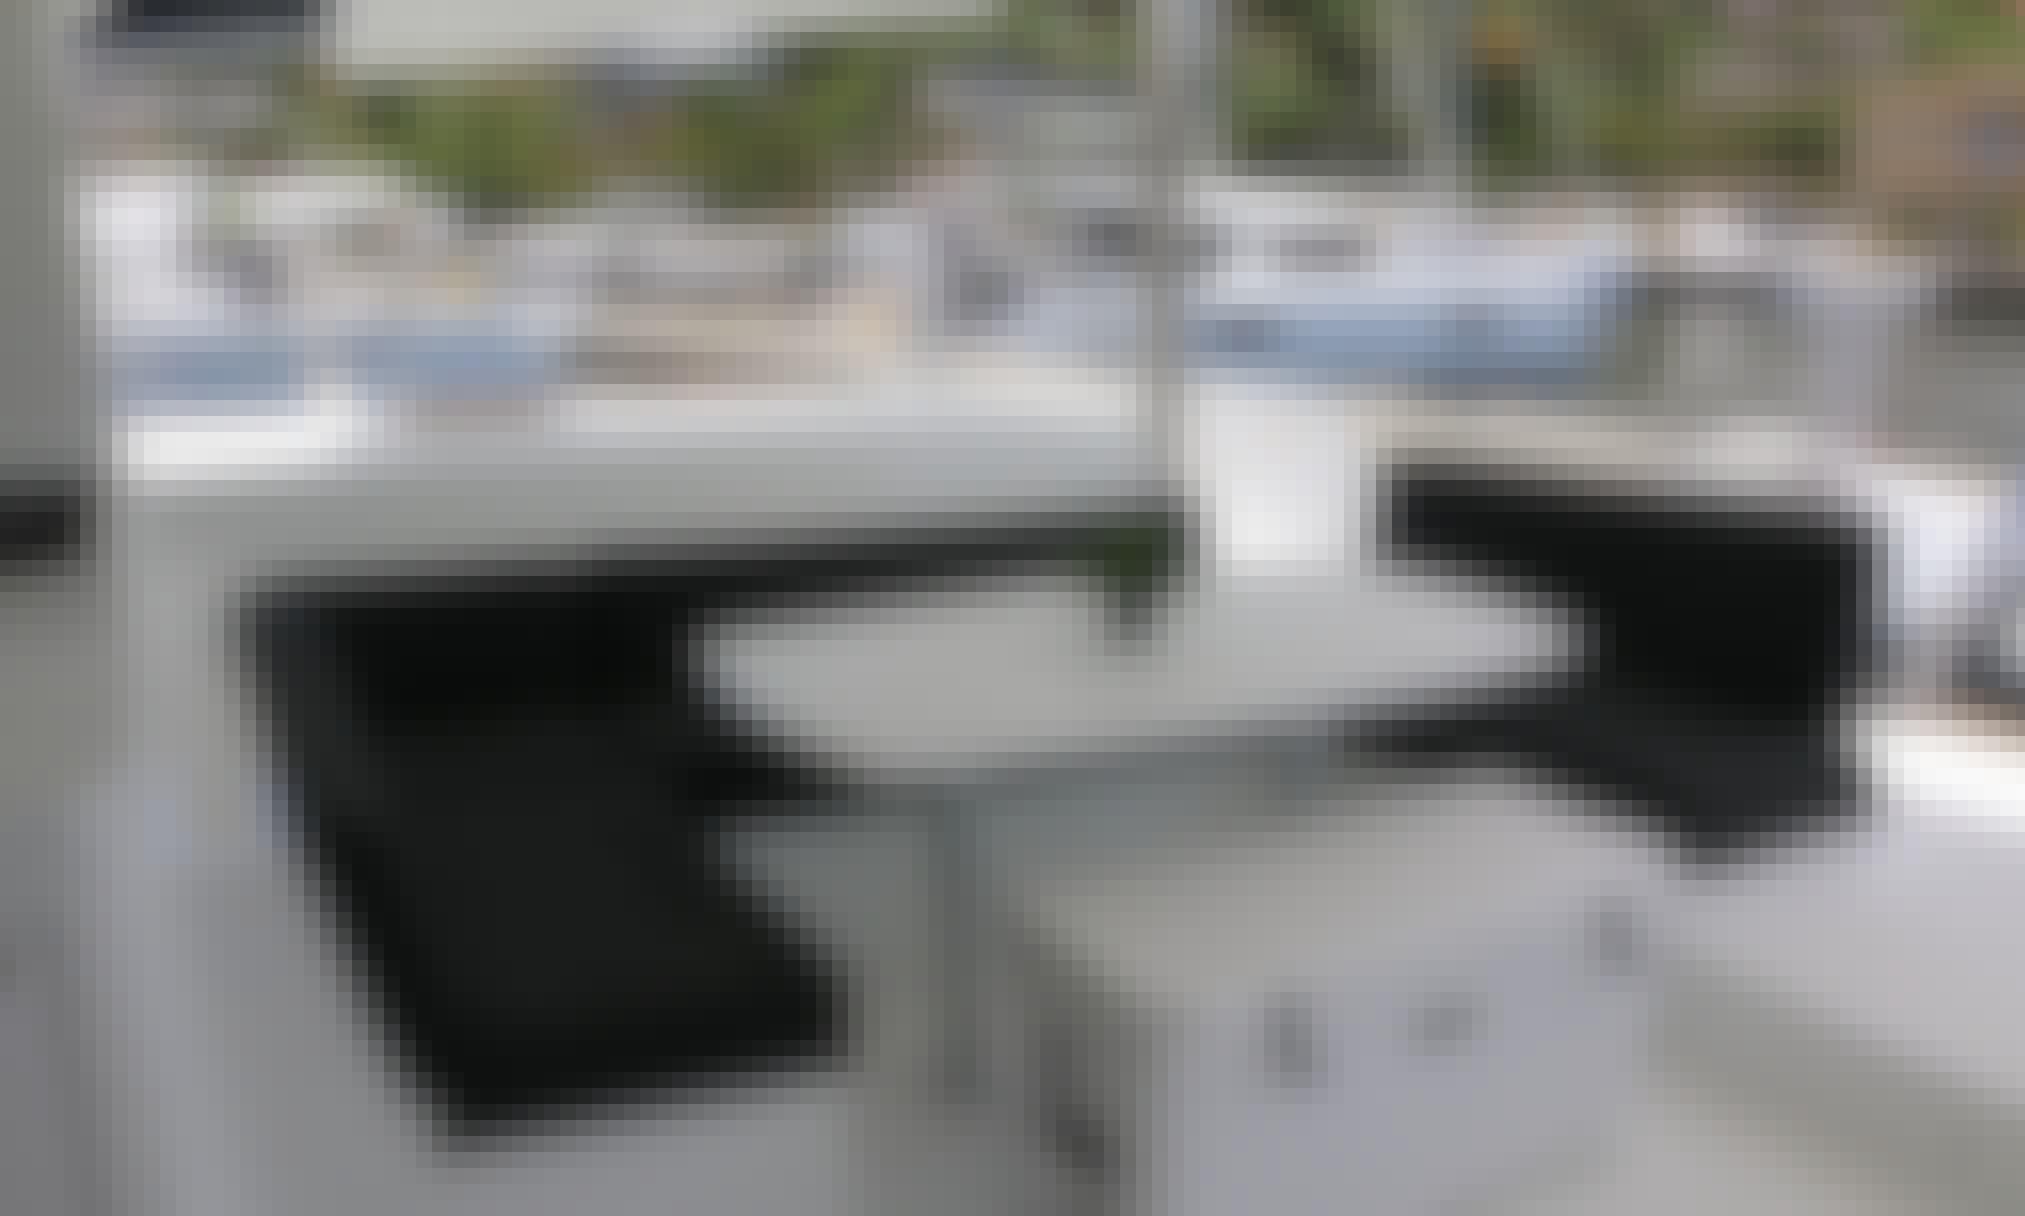 Brandnew Lagoon 52 Sailing Catamaran with 5 Cabins in Road Town, Tortola